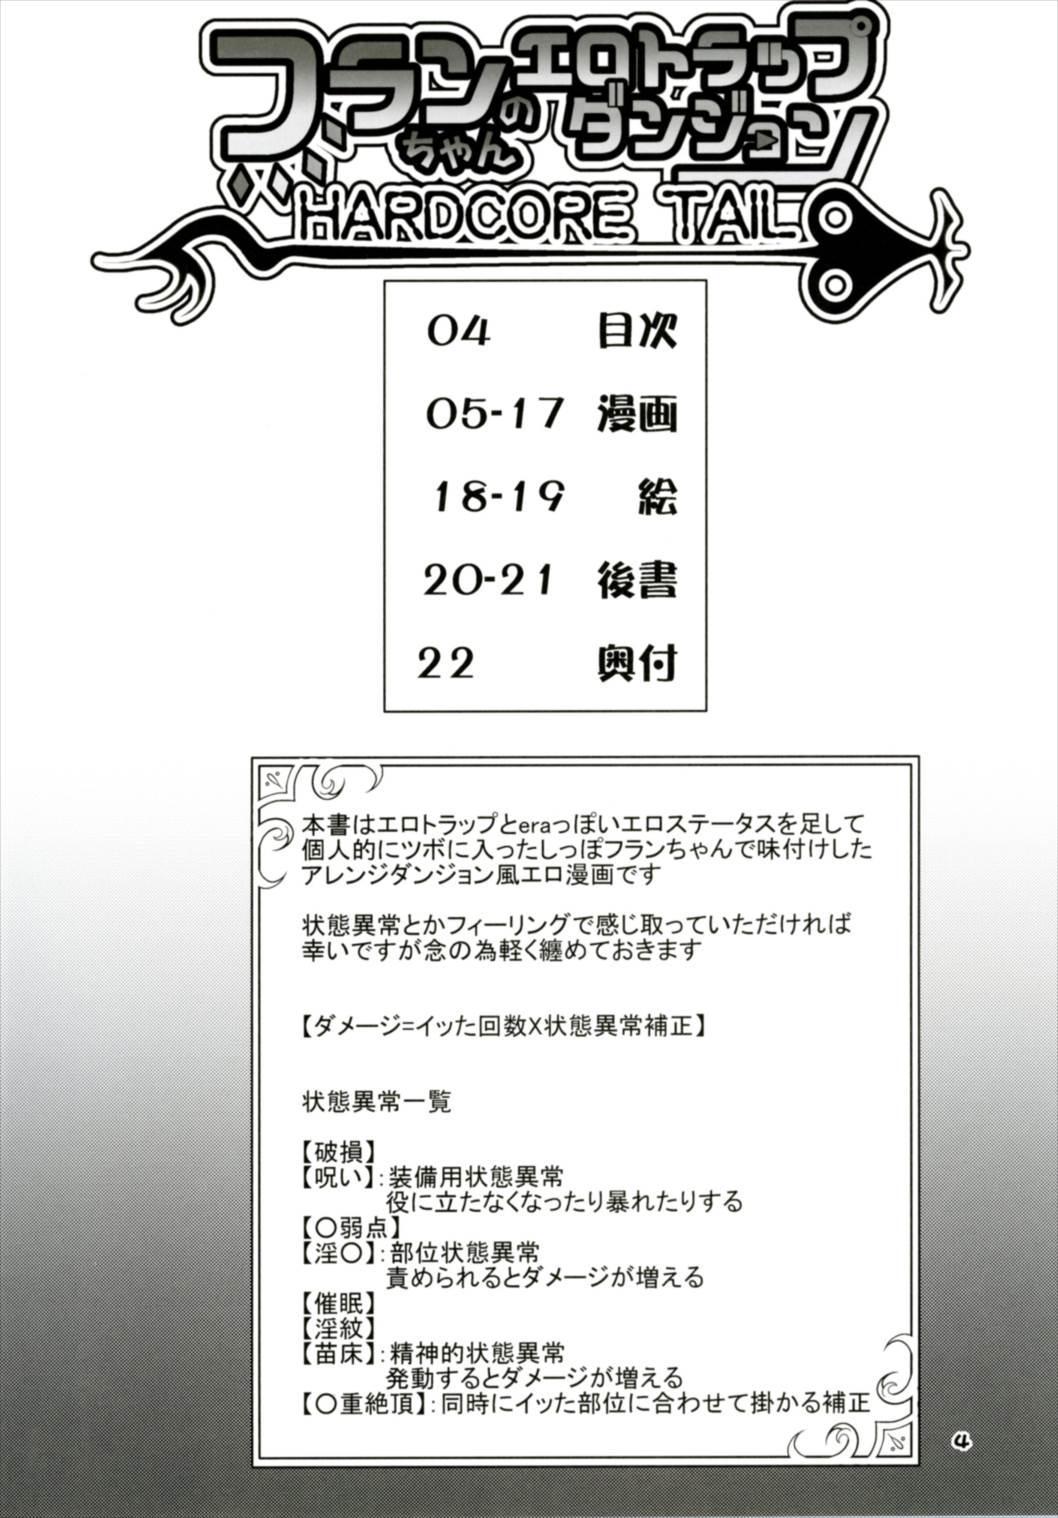 Flan-chan no Ero Trap Dungeon HARDCORE TAIL 2